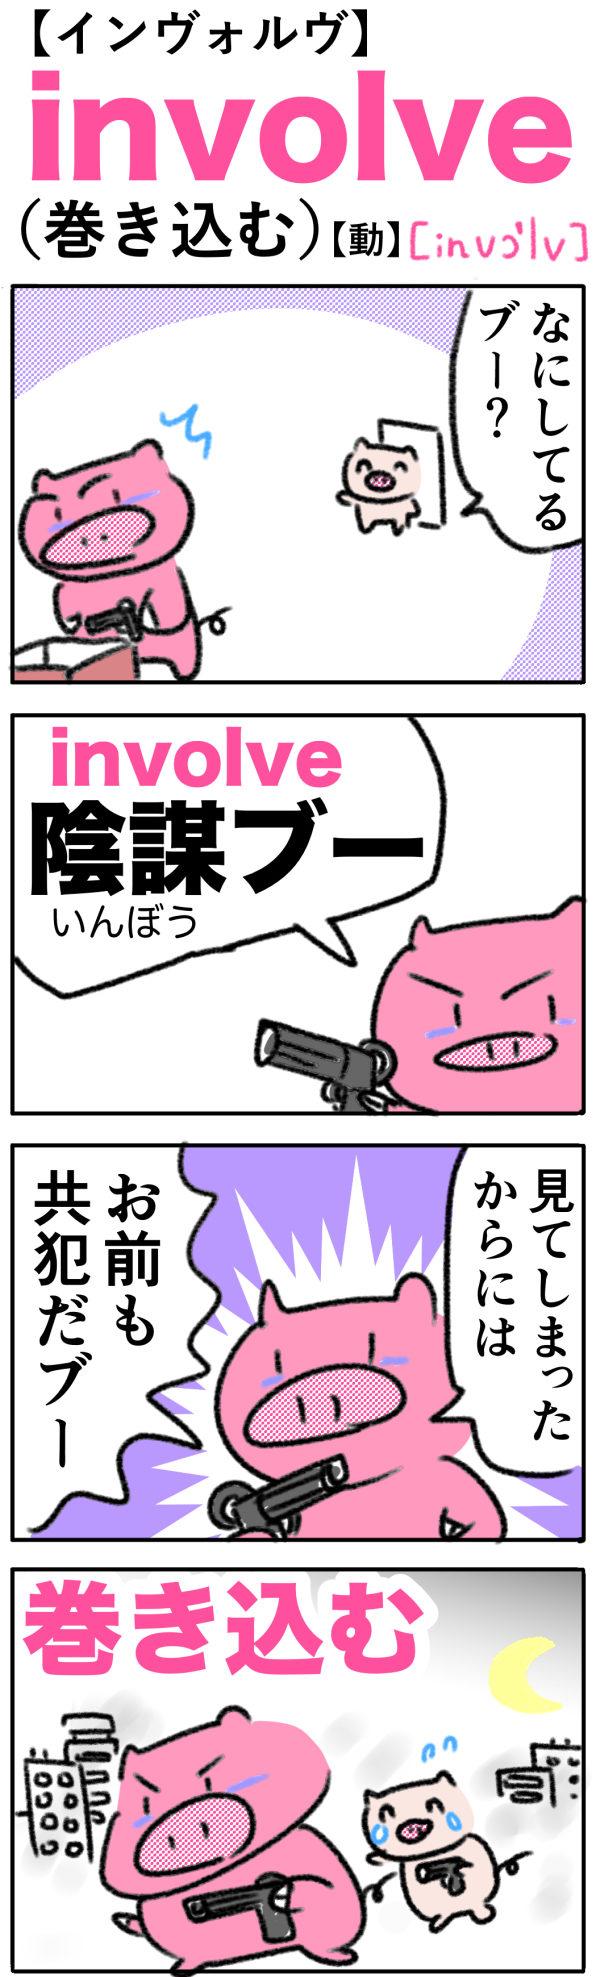 involve(巻き込む)の語呂合わせ英単語